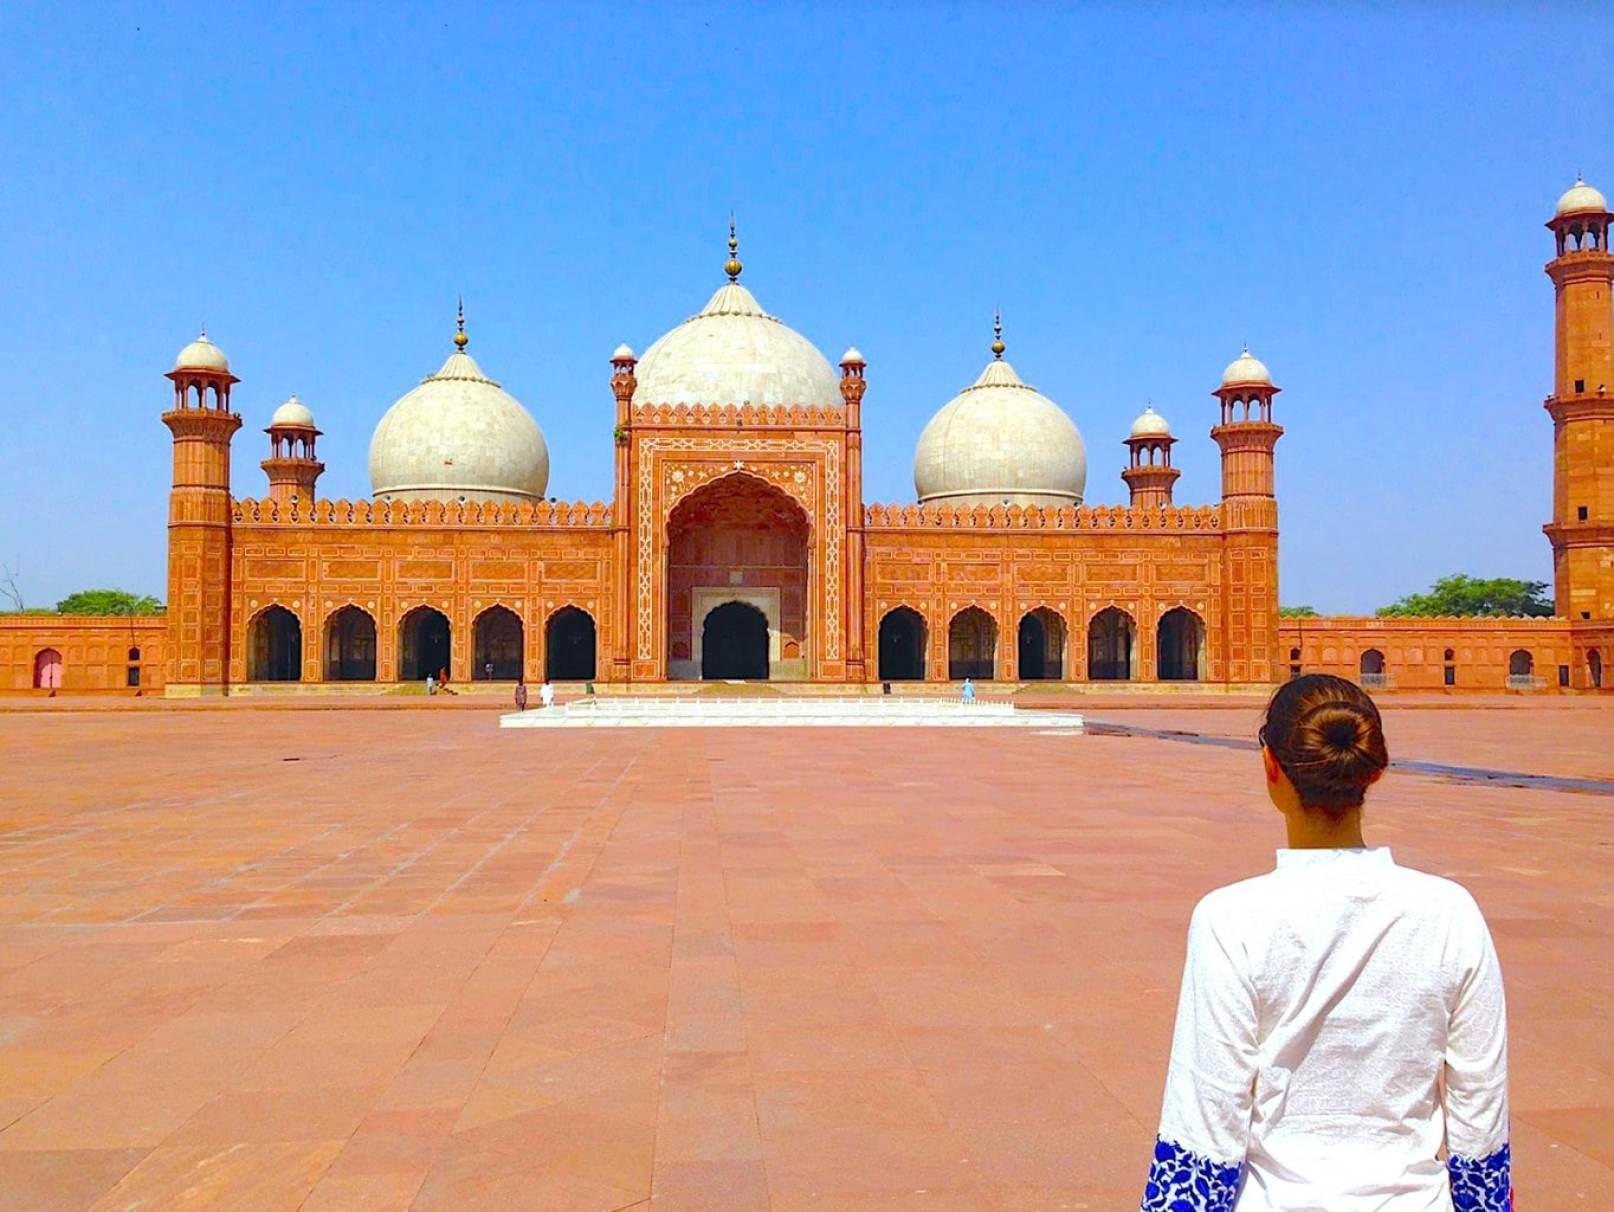 Badshahi Mosque view